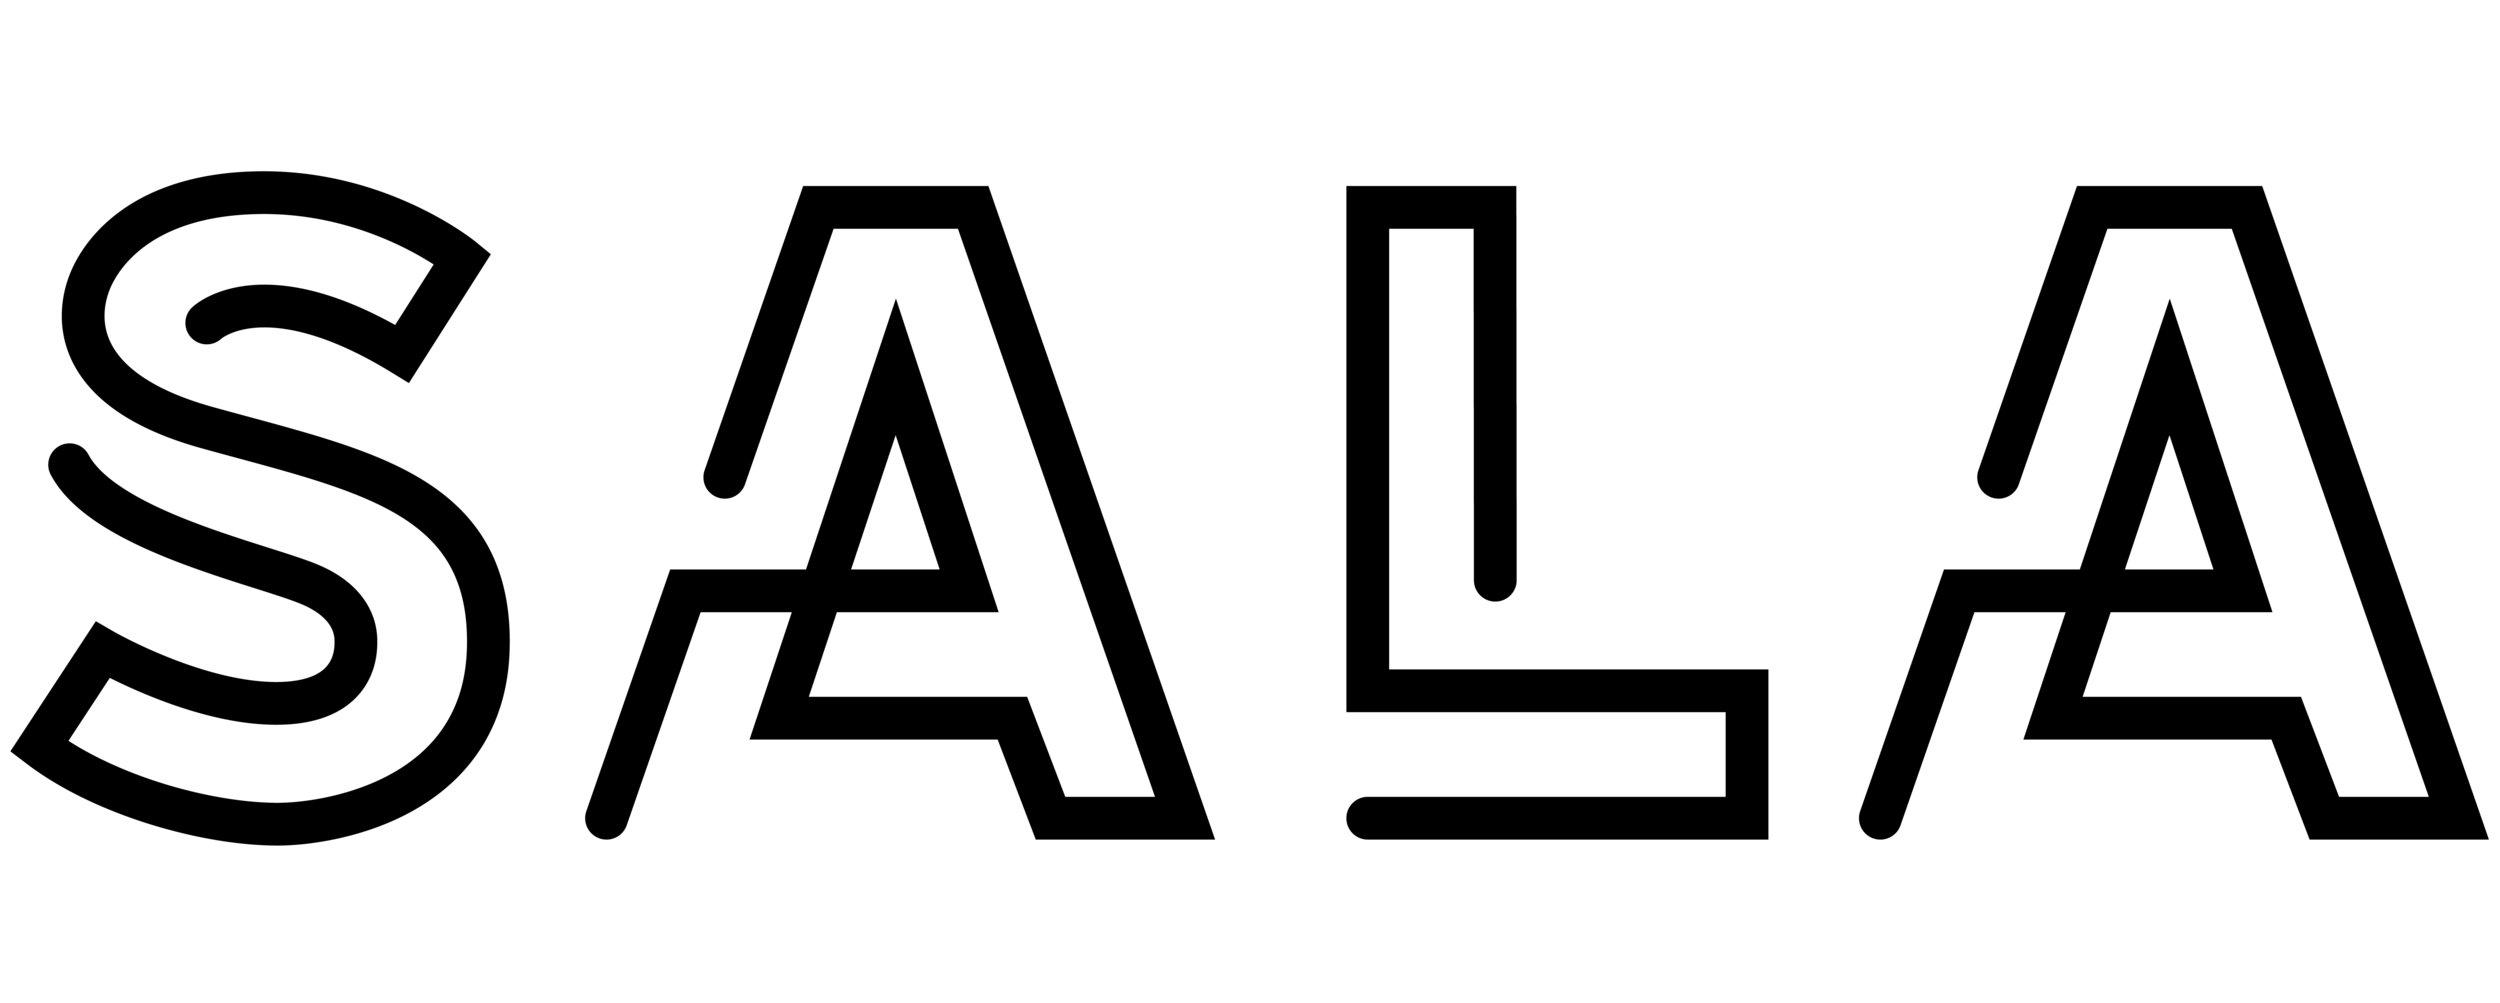 SALA-mono-POS.jpg